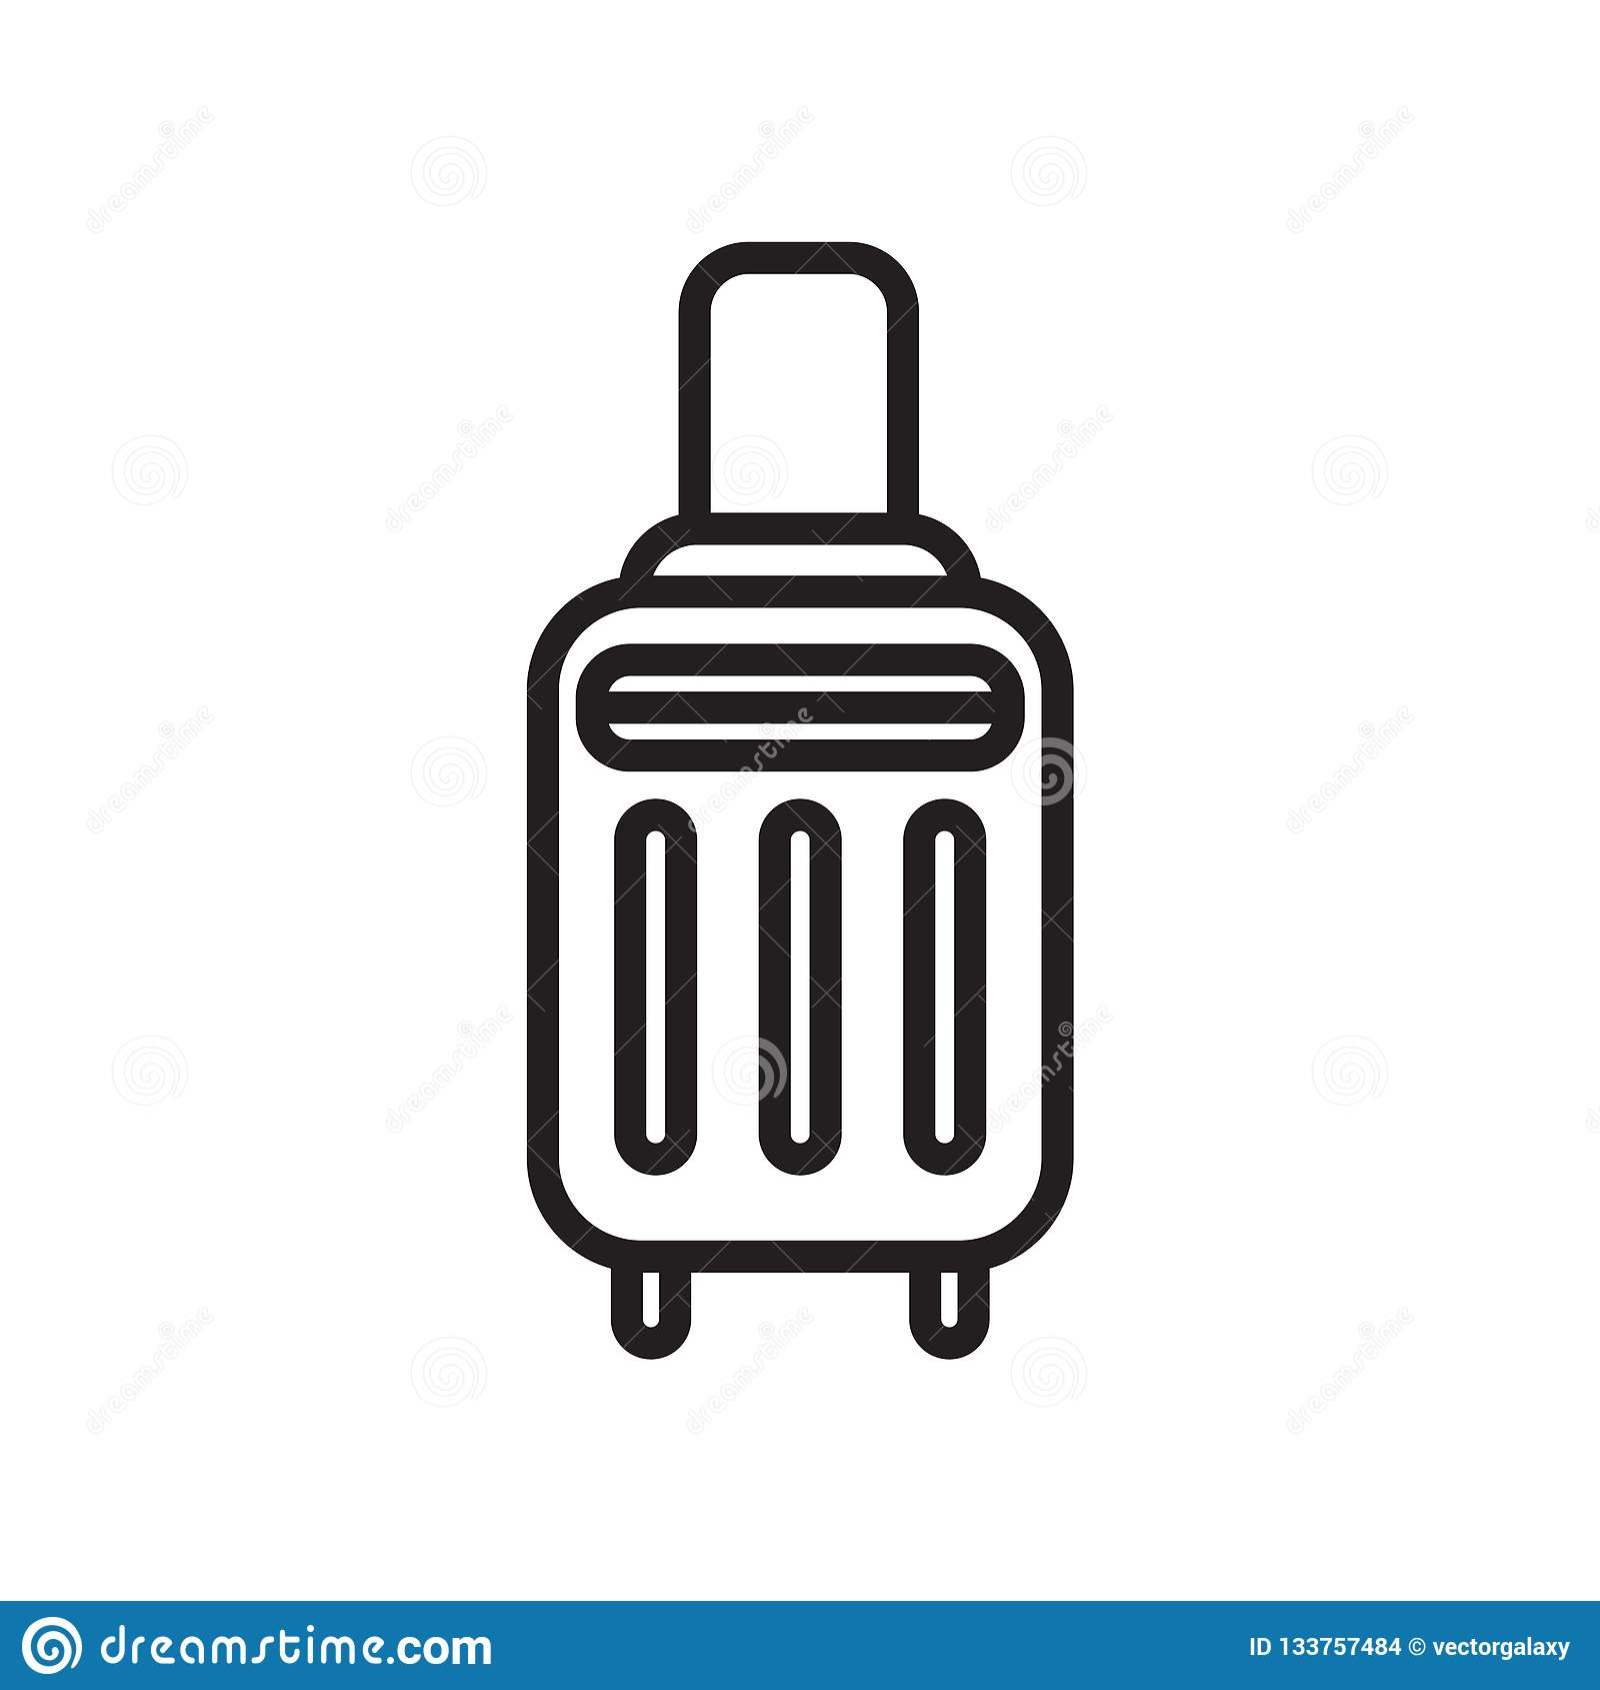 Знак и символ вектора значка чемодана изолированные на белой предпосылке, концепции логотипа чемодана